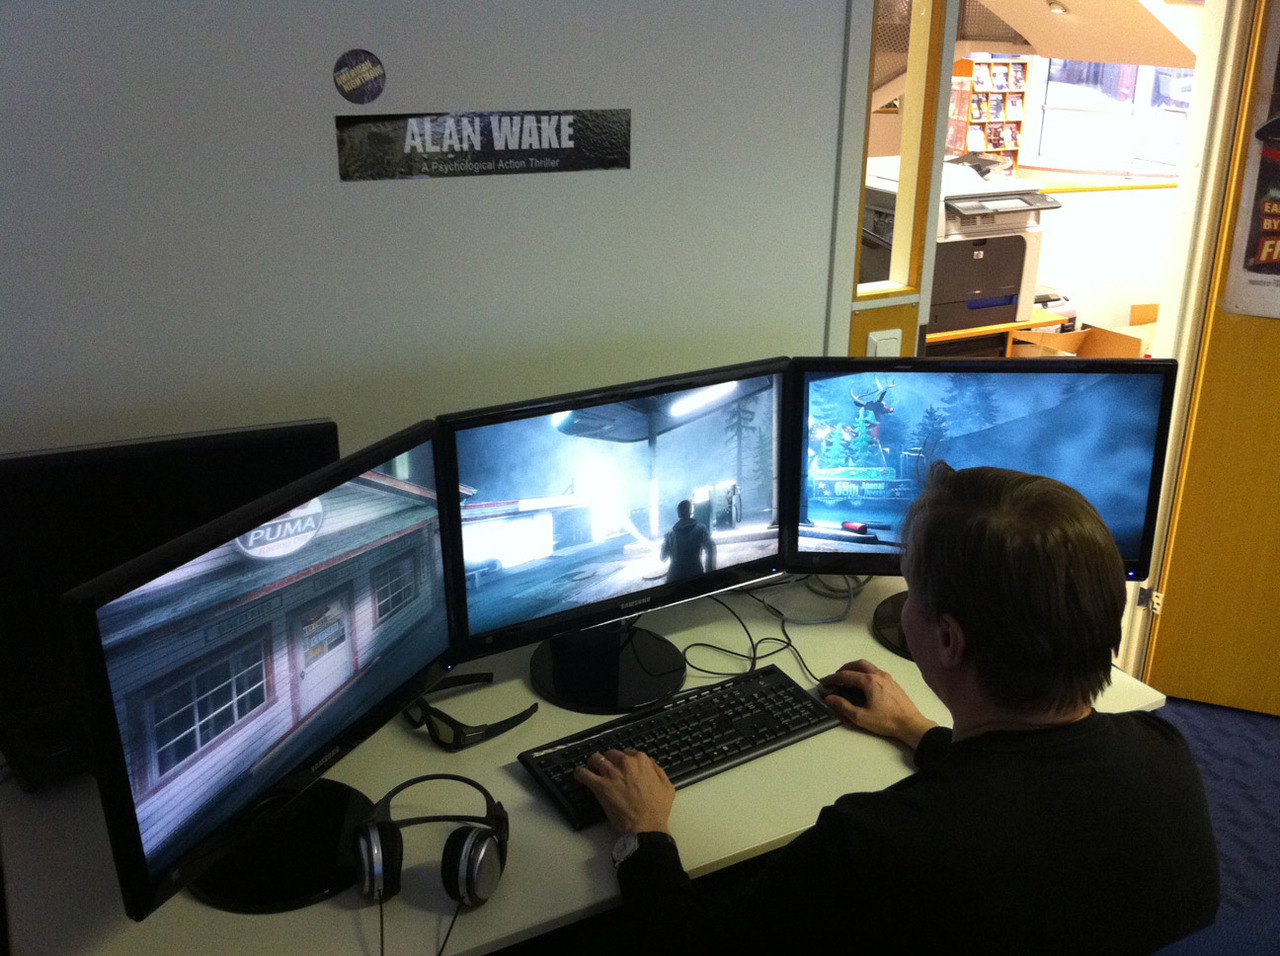 Alan Wake Plus Grand Et Plus Profond Sur Pc Actualit 233 S